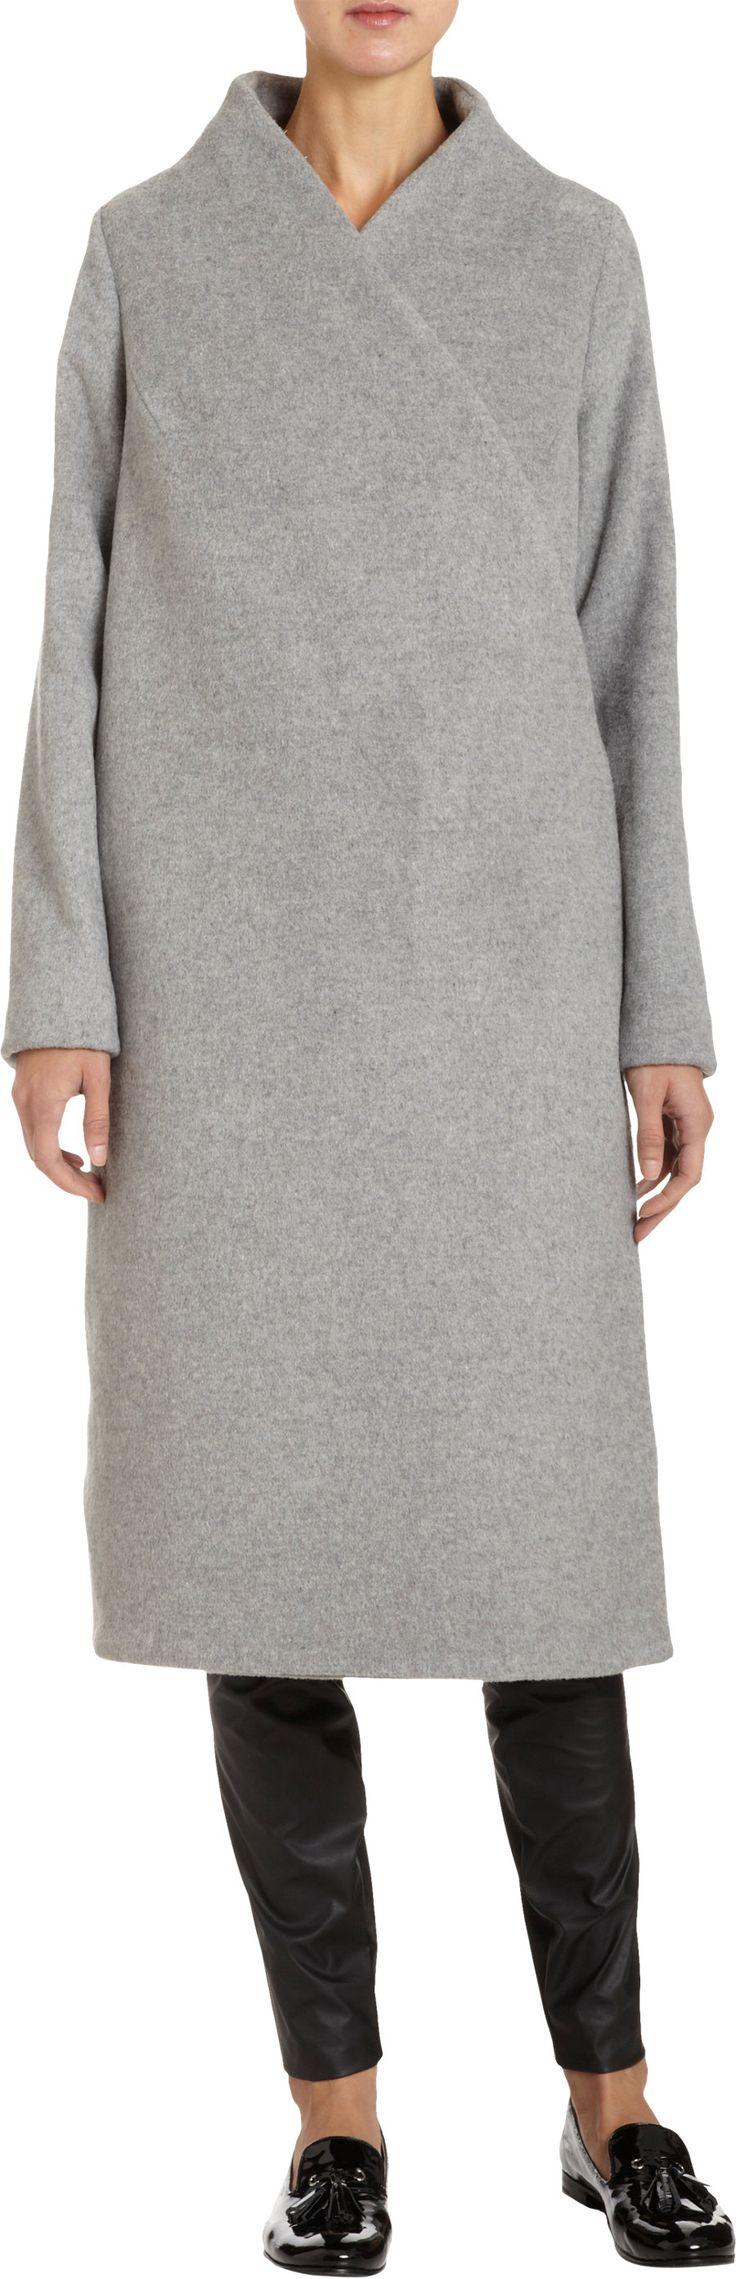 Wayne Hyperion Coat at Barneys.com